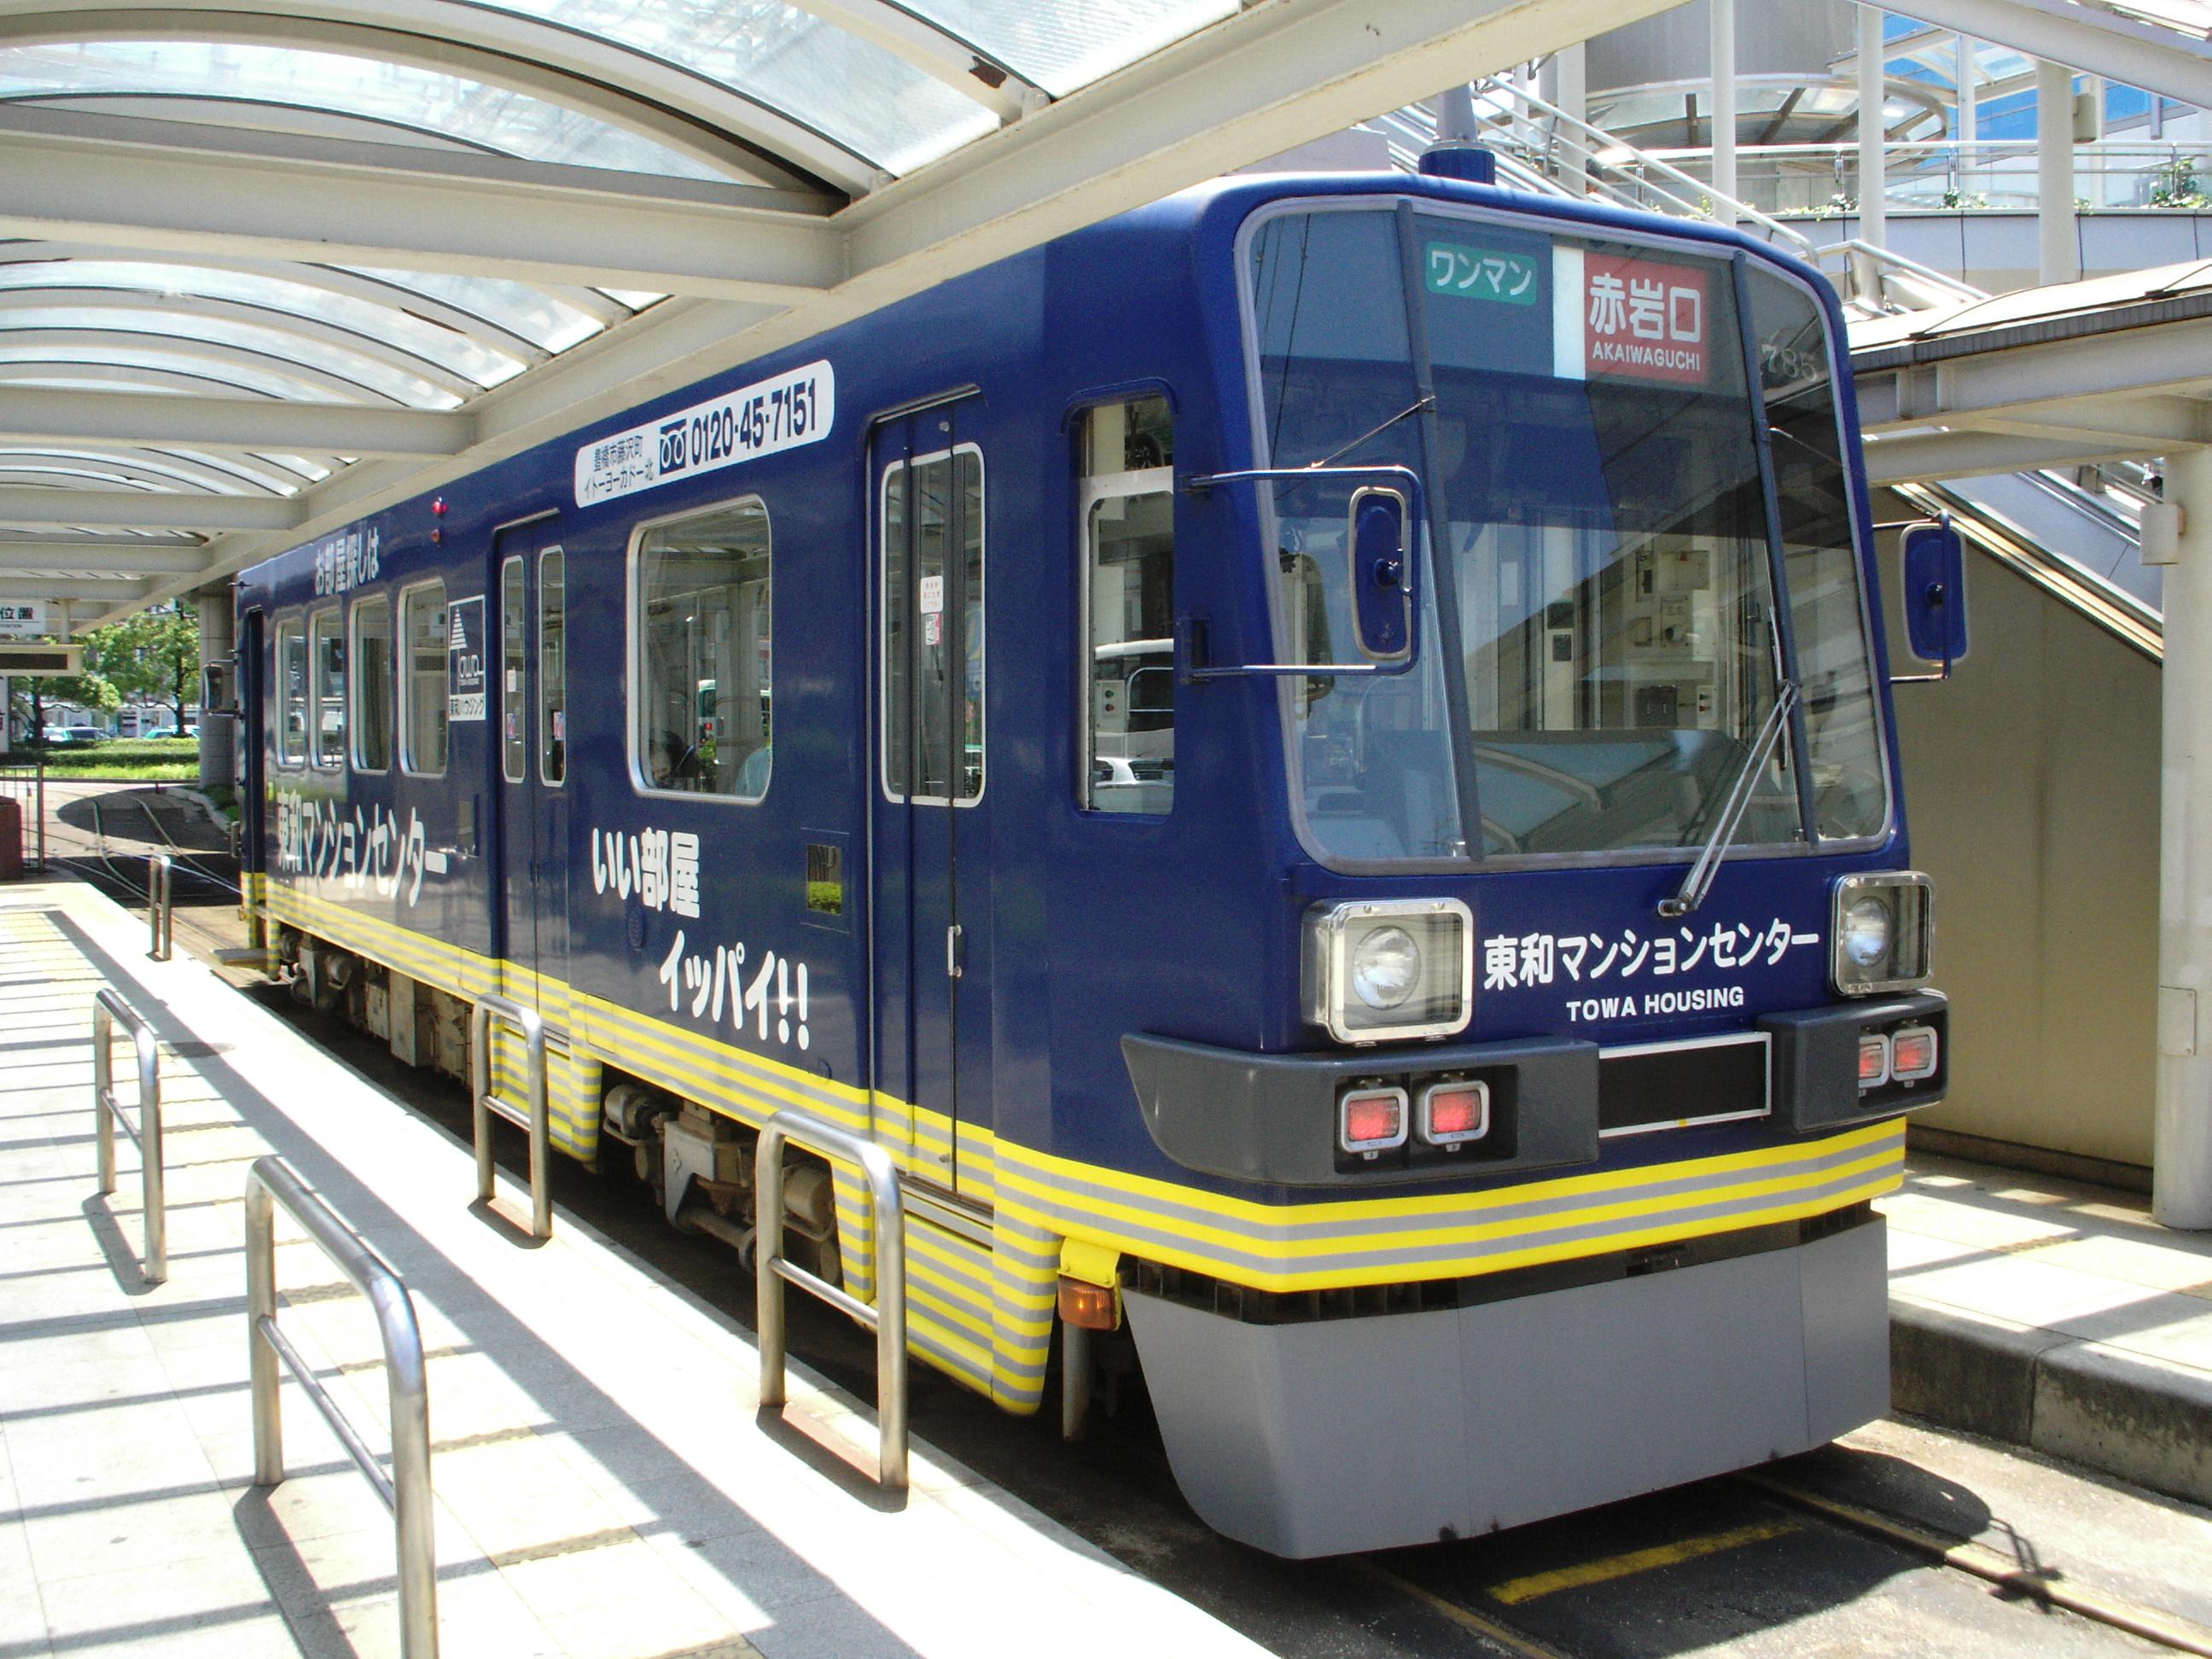 File:Toyotetsu mo 785.jpg